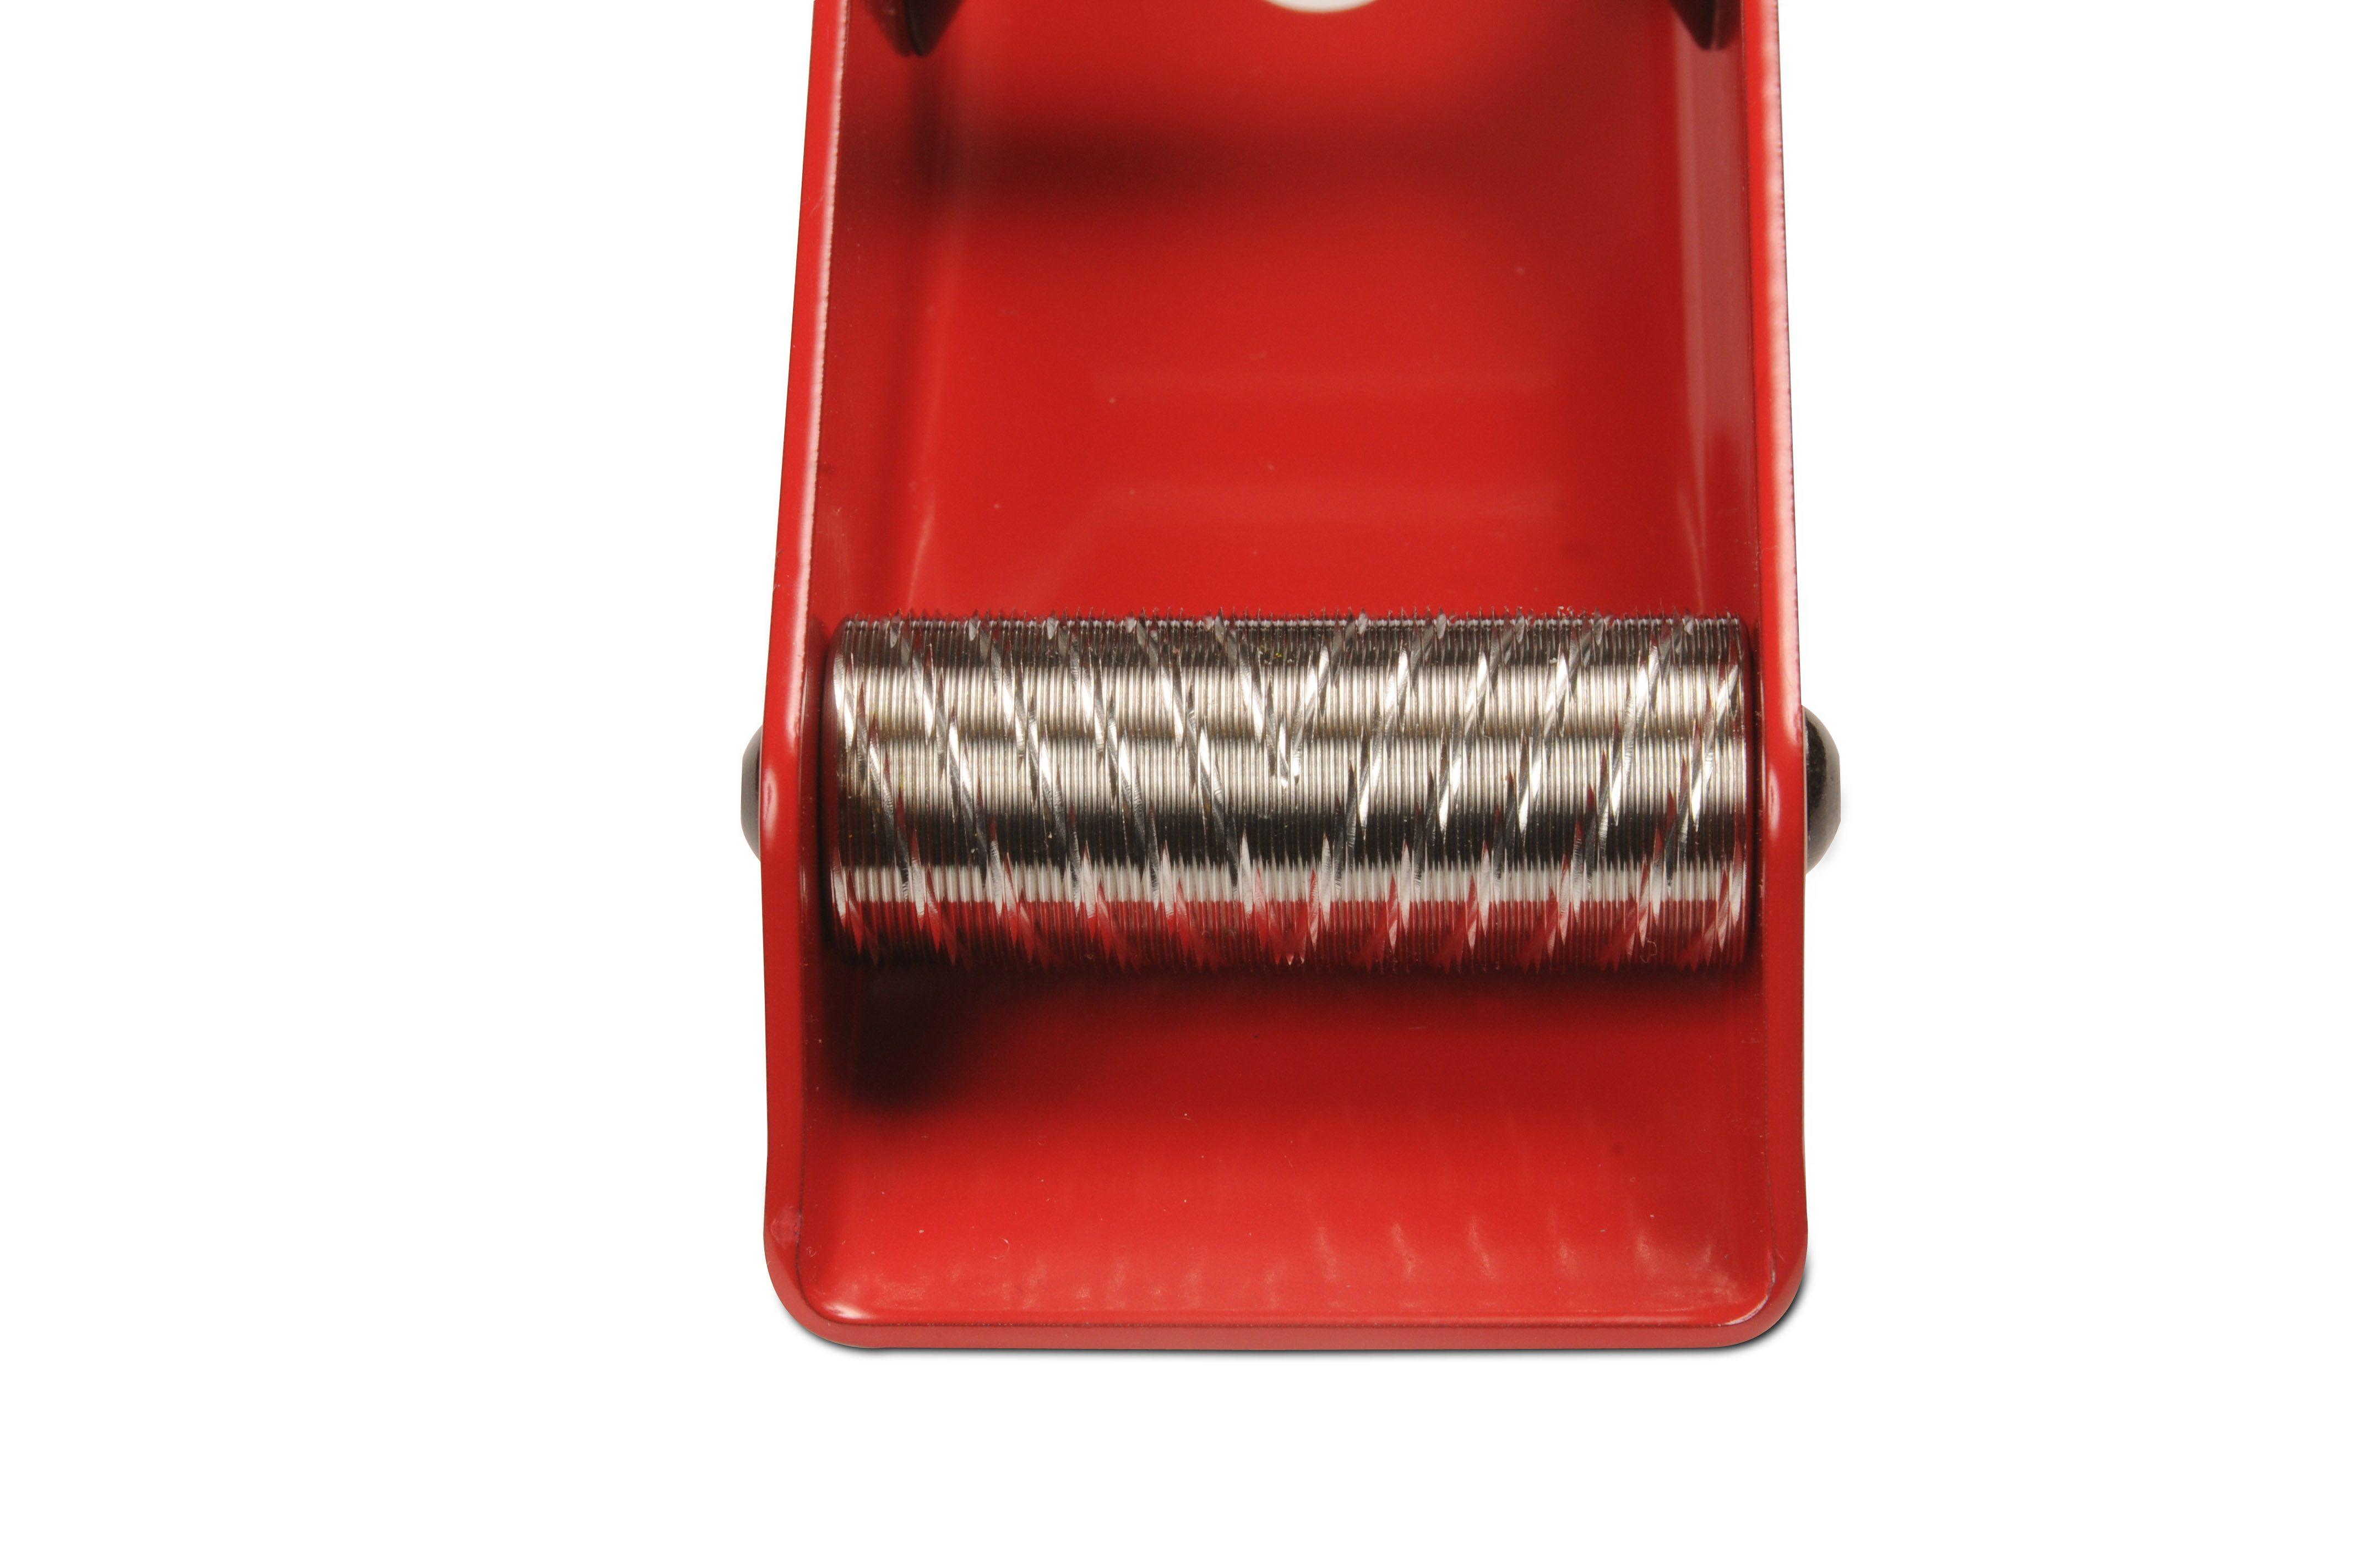 Rilleverktøy langrenn grovt traktormønster +15 - -5 C